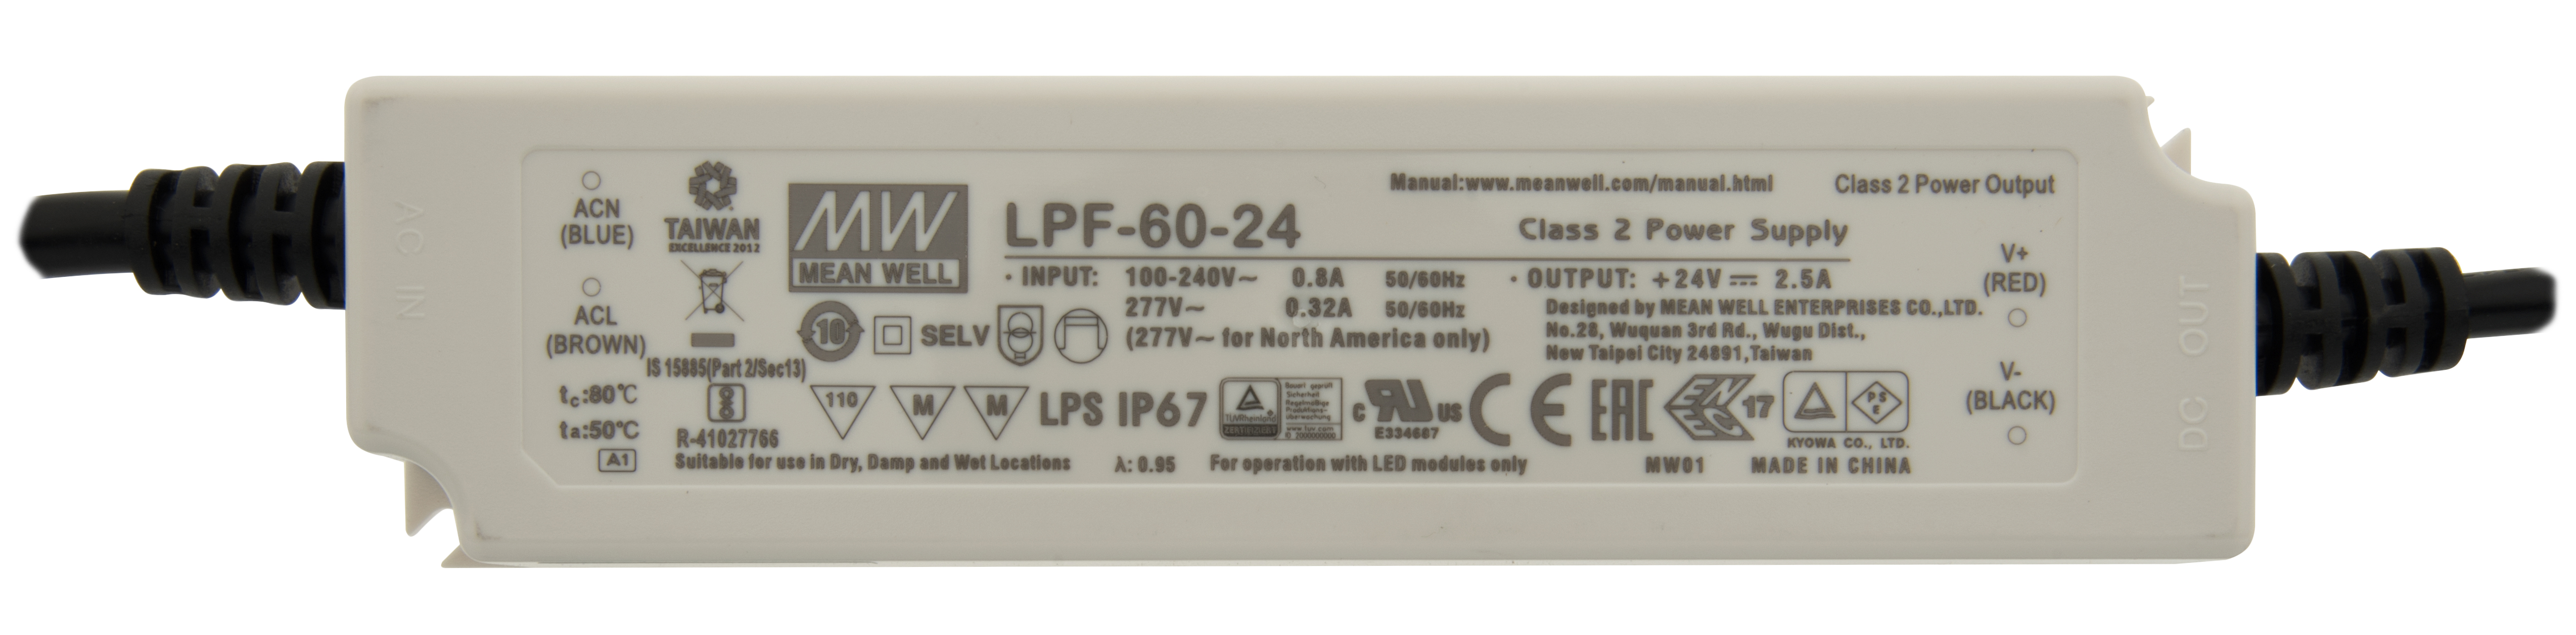 1 Stk LED LPF - Netzteil 60W/48V MM IP67 LINT048060